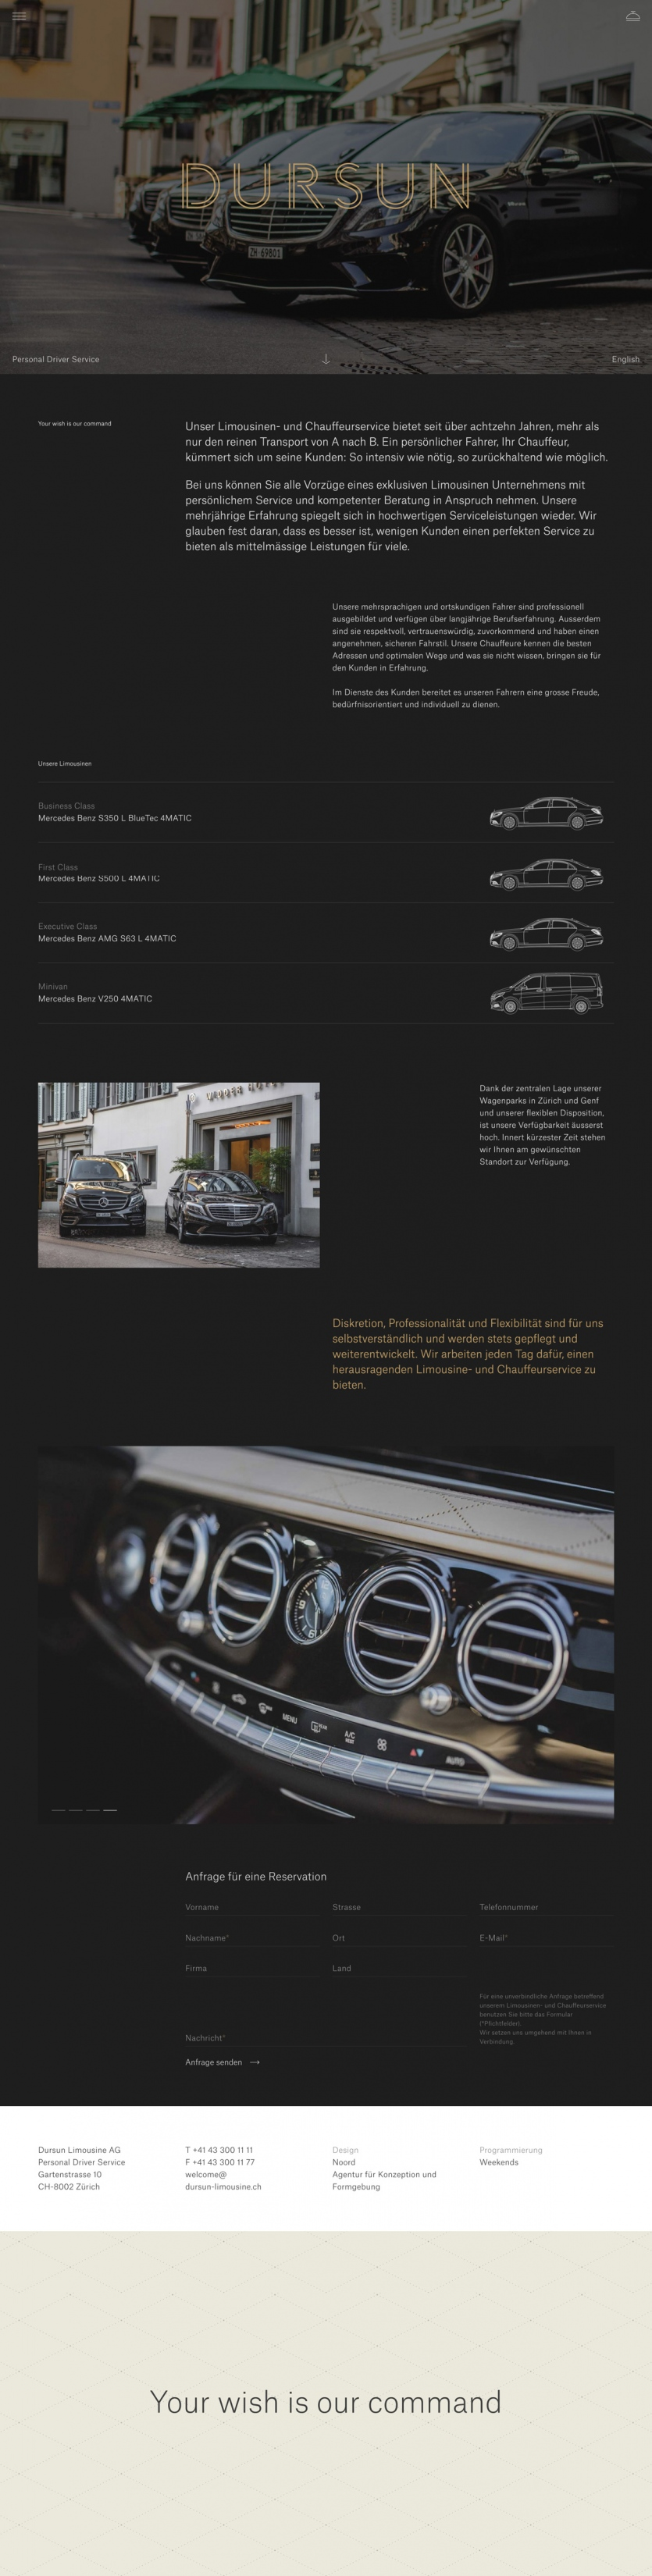 Dursun Personal Driver Service Mindsparkle Mag Web Design Inspiration Person Web Design